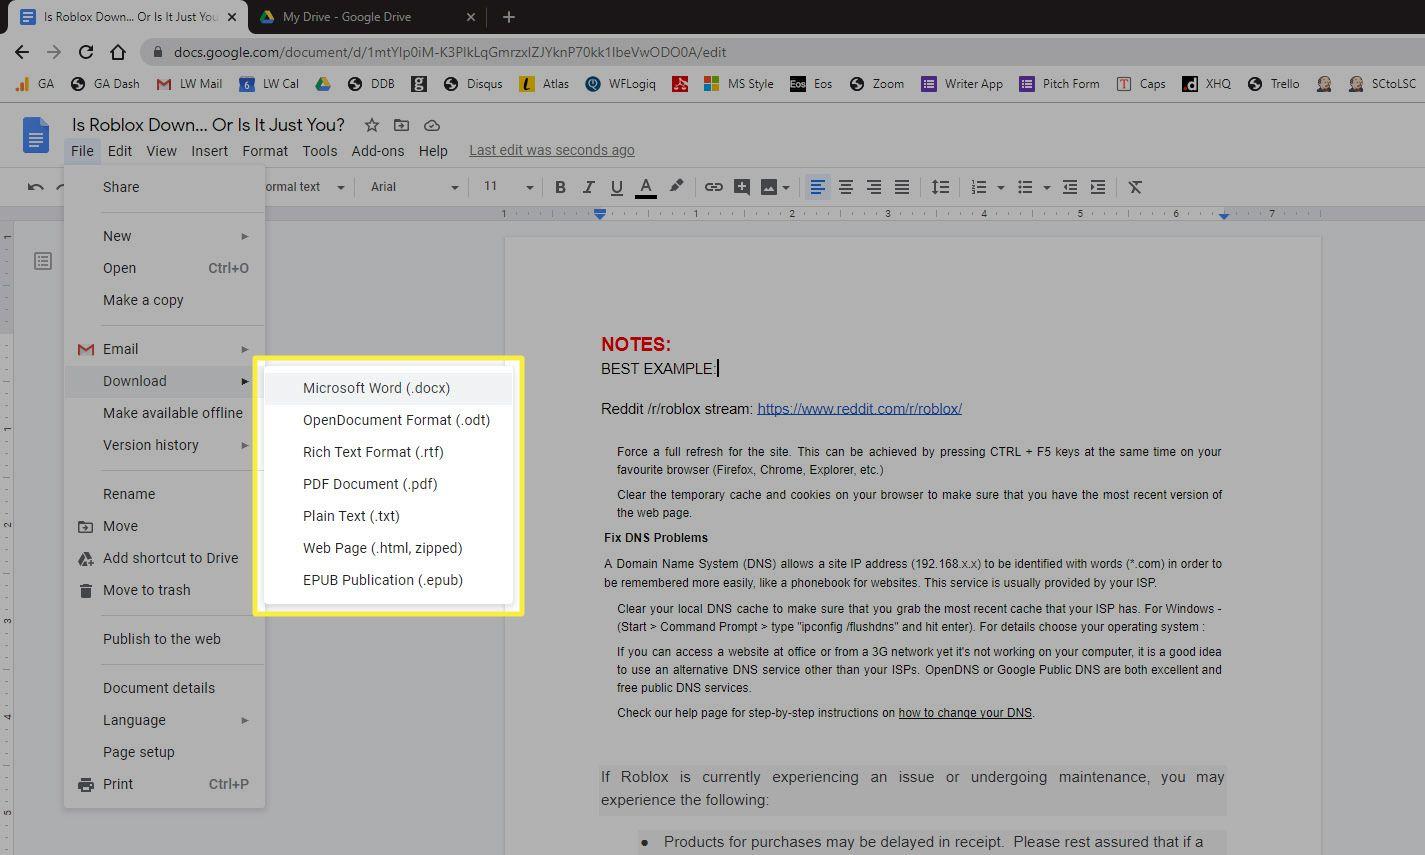 Download as Microsoft Word (.docx) menu item in Google document File menu